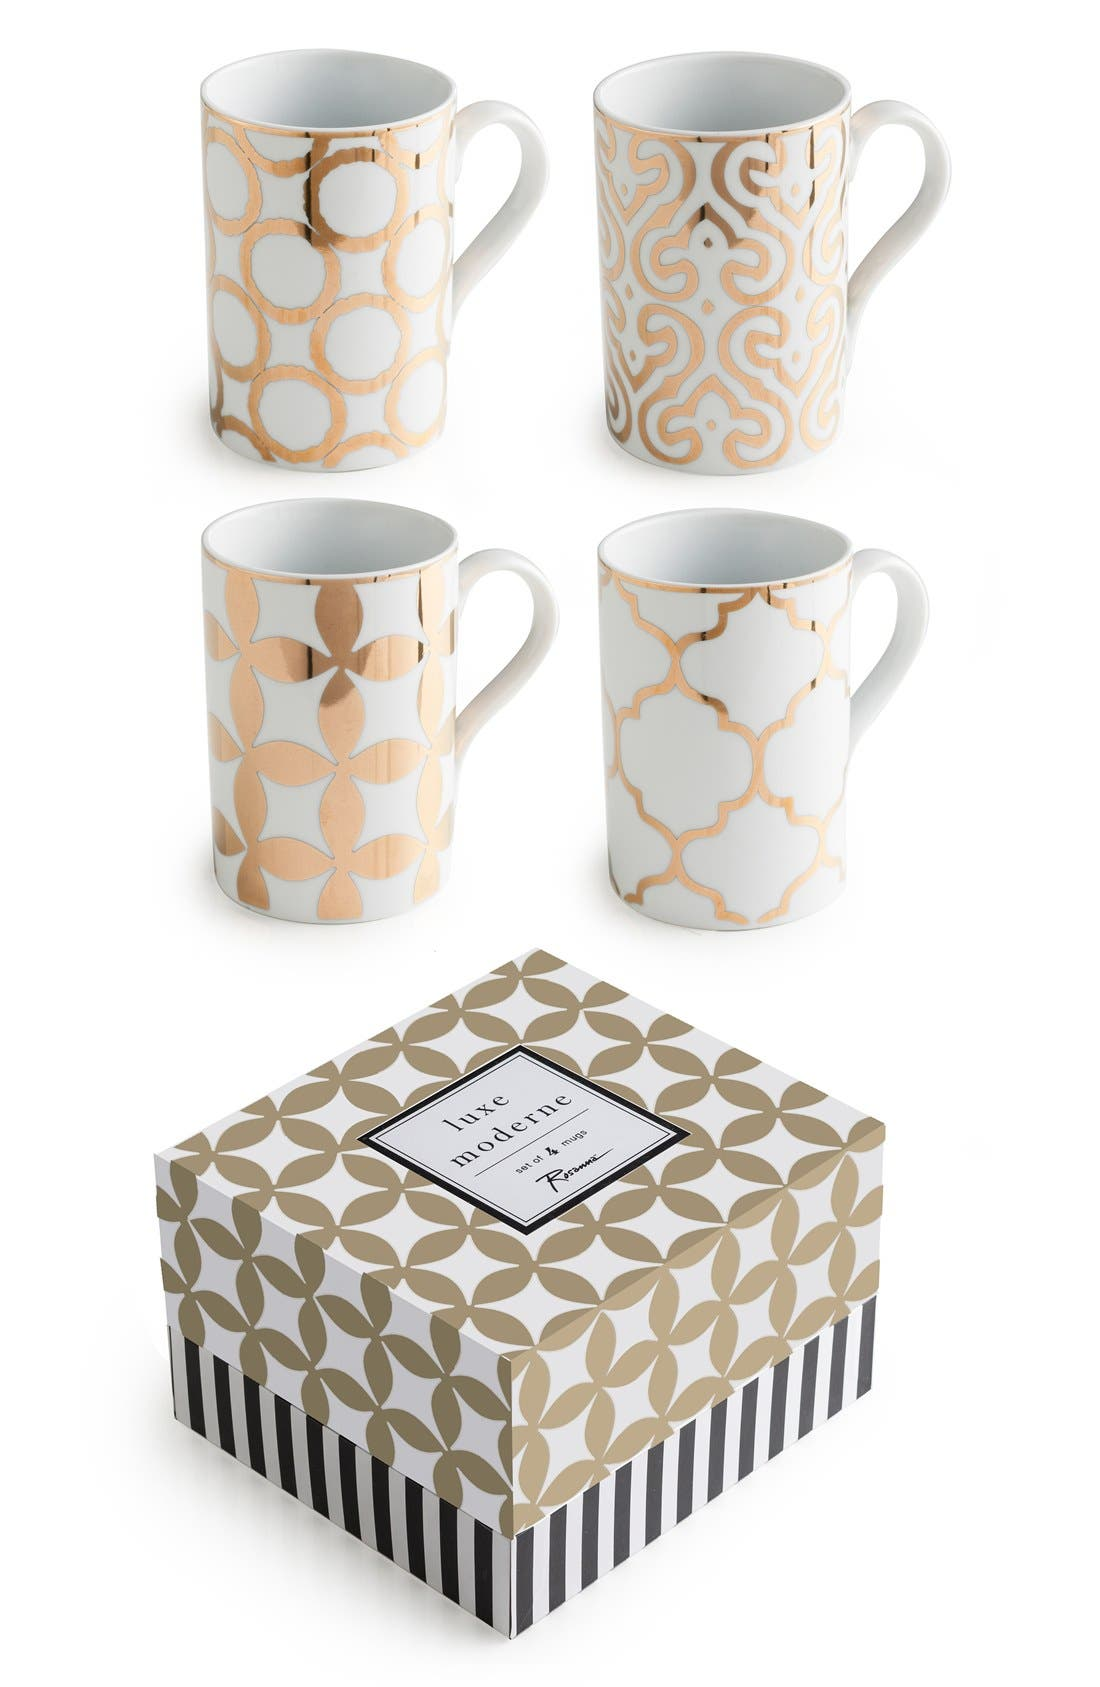 ROSANNA 'Luxe Moderne' Coffee Mugs